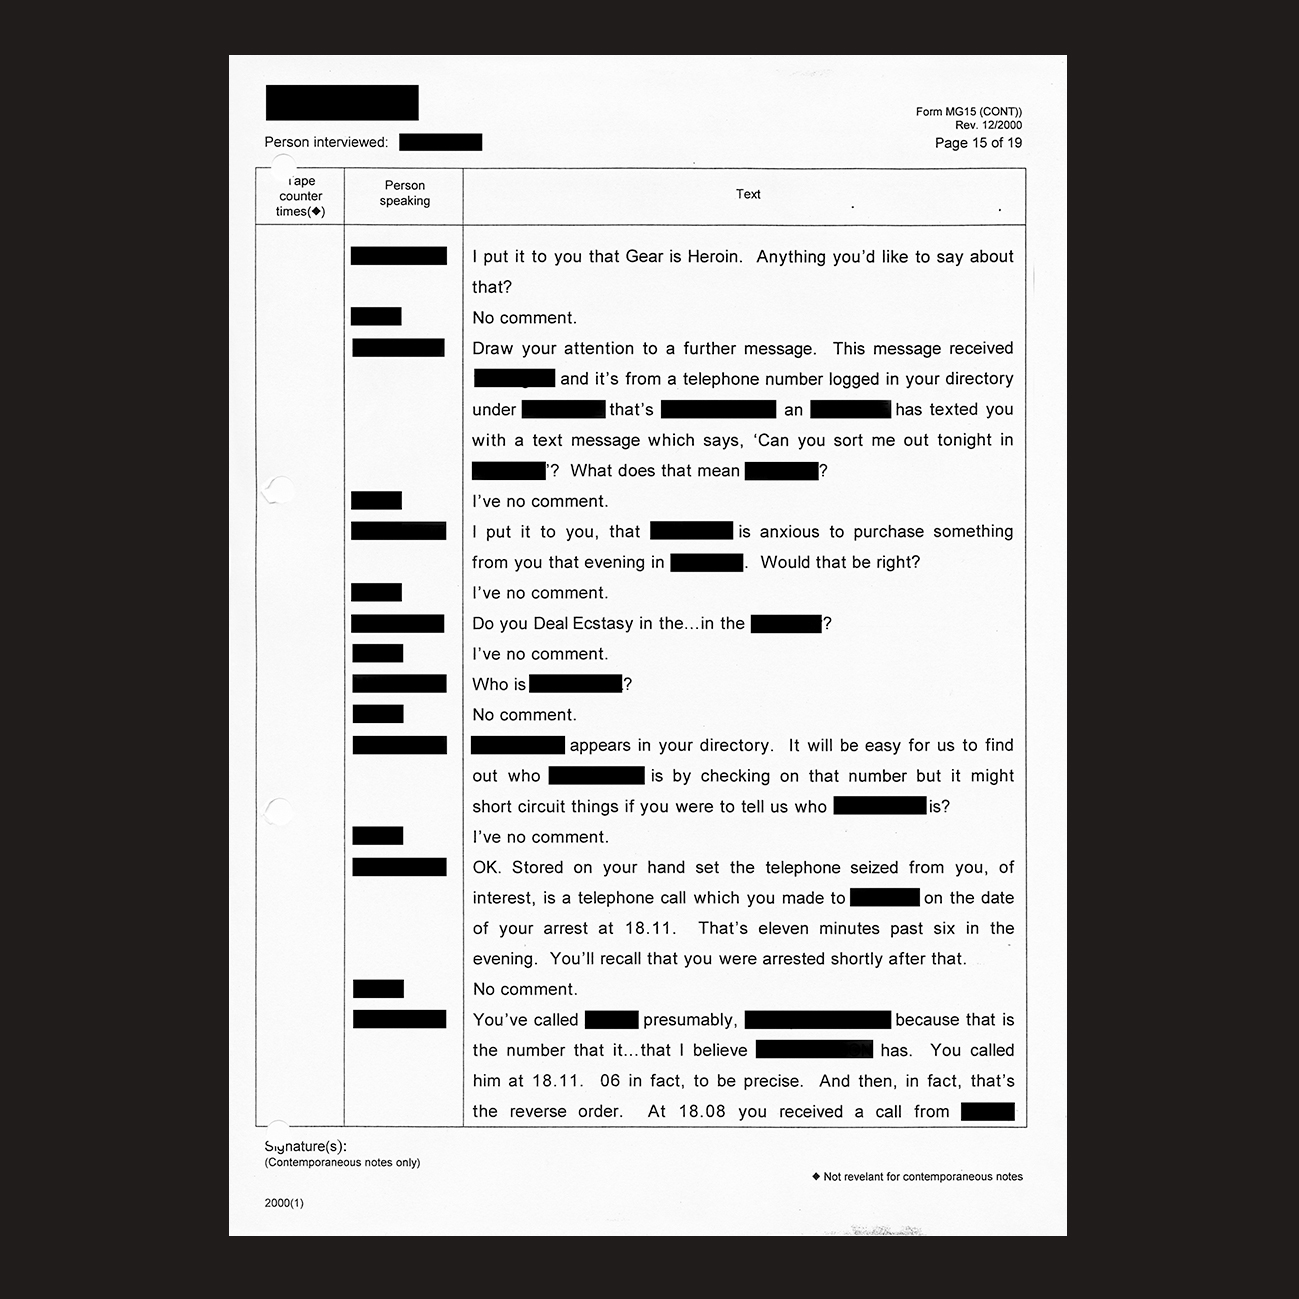 JM Bail 150 - Interview 12 - Do You Deal Ecstasy.jpg